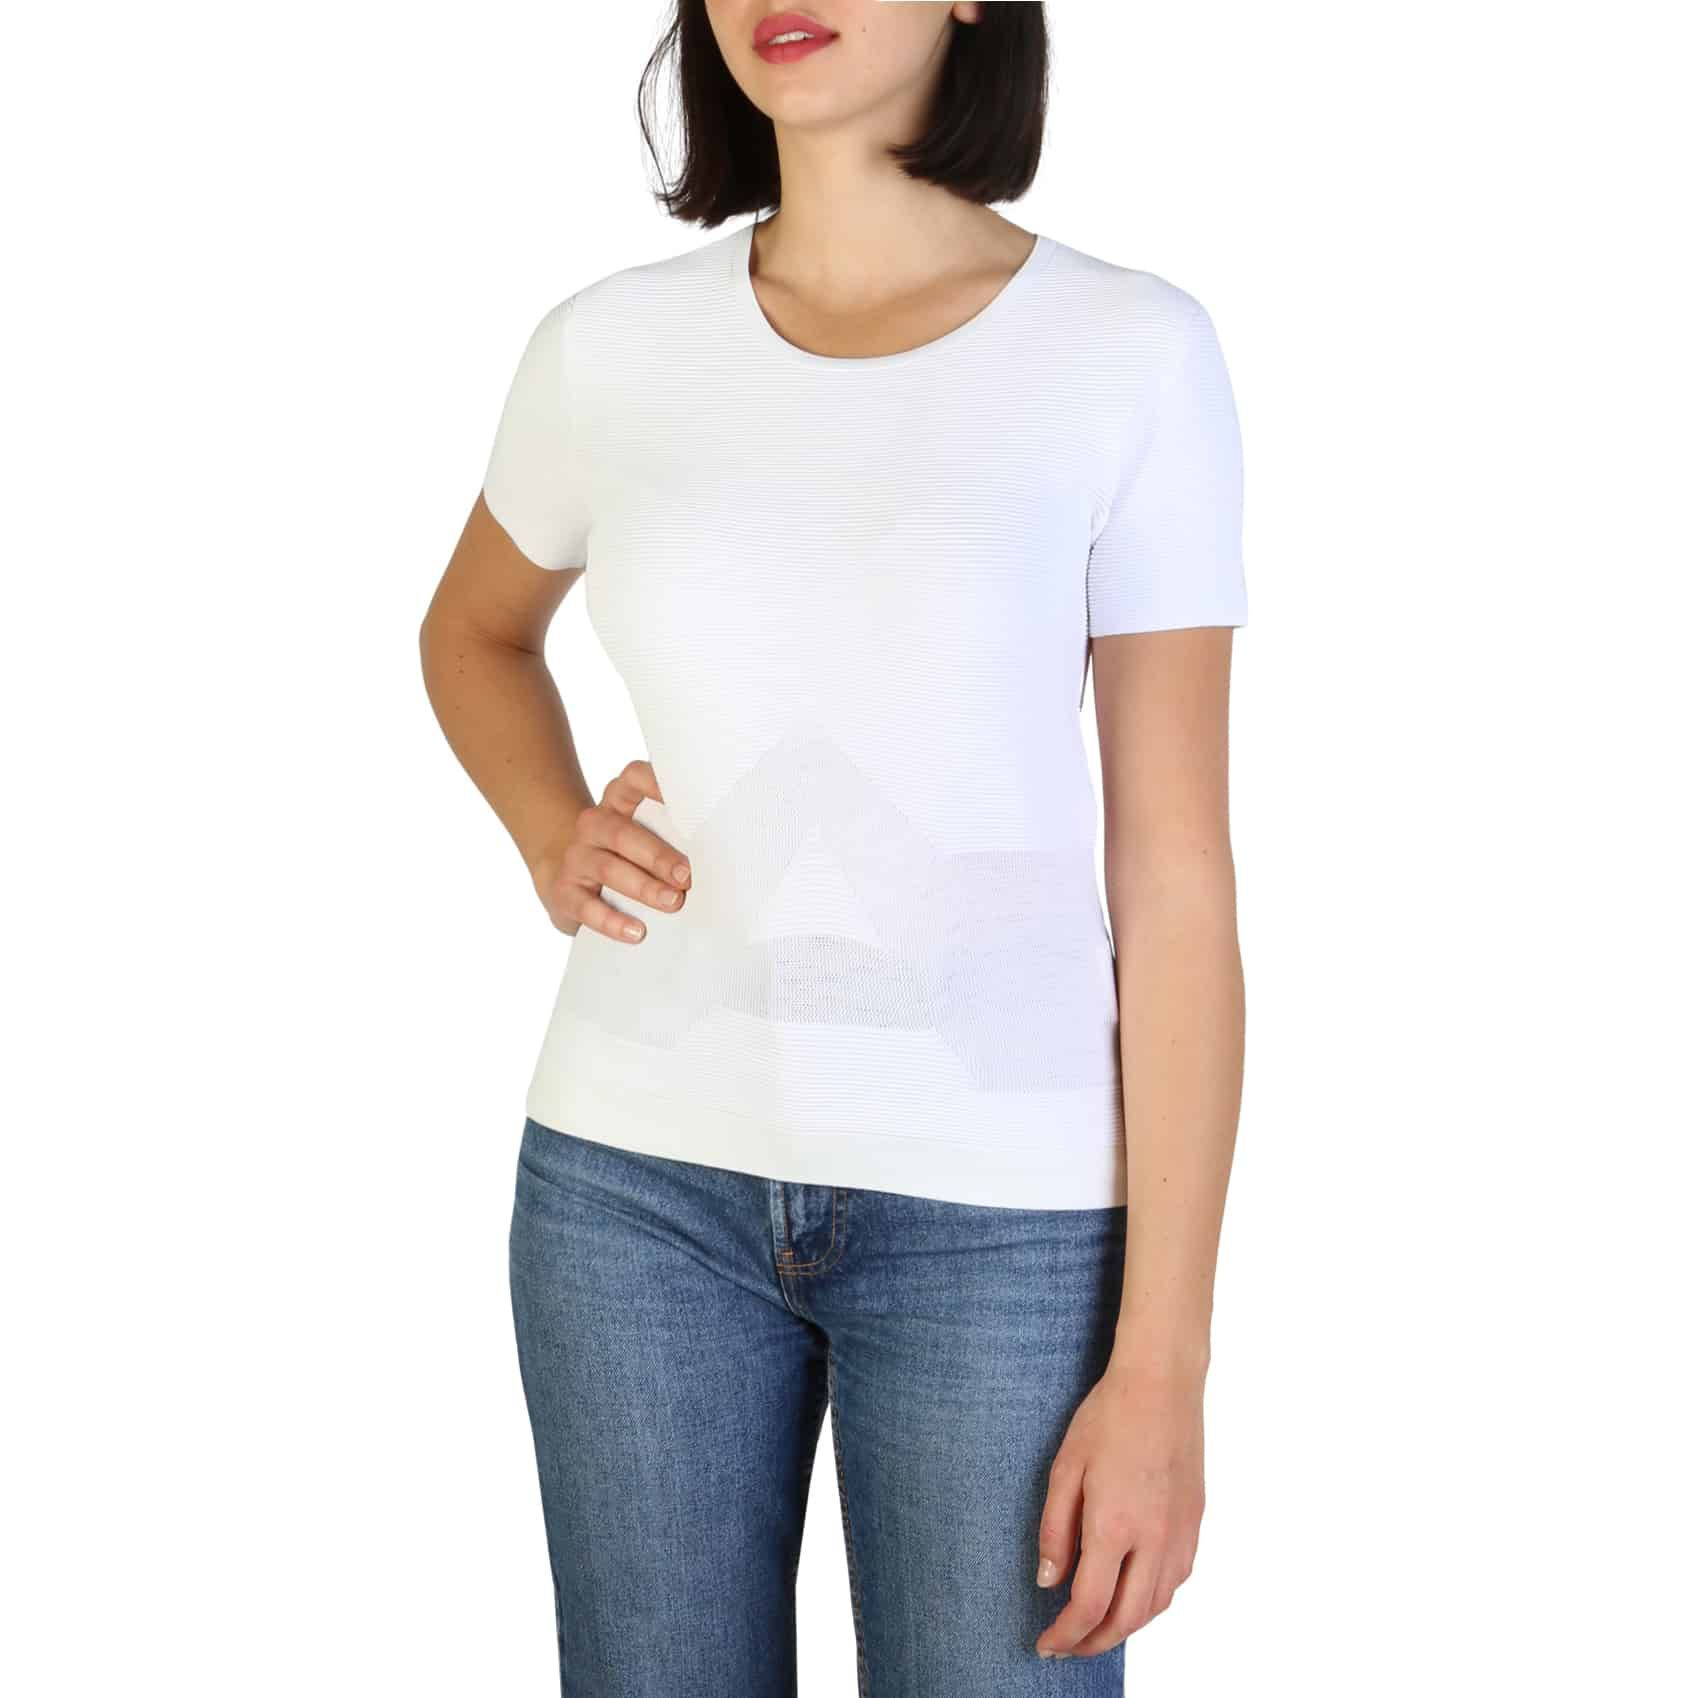 T-shirt Armani Jeans3Y5M2L_5M22Z